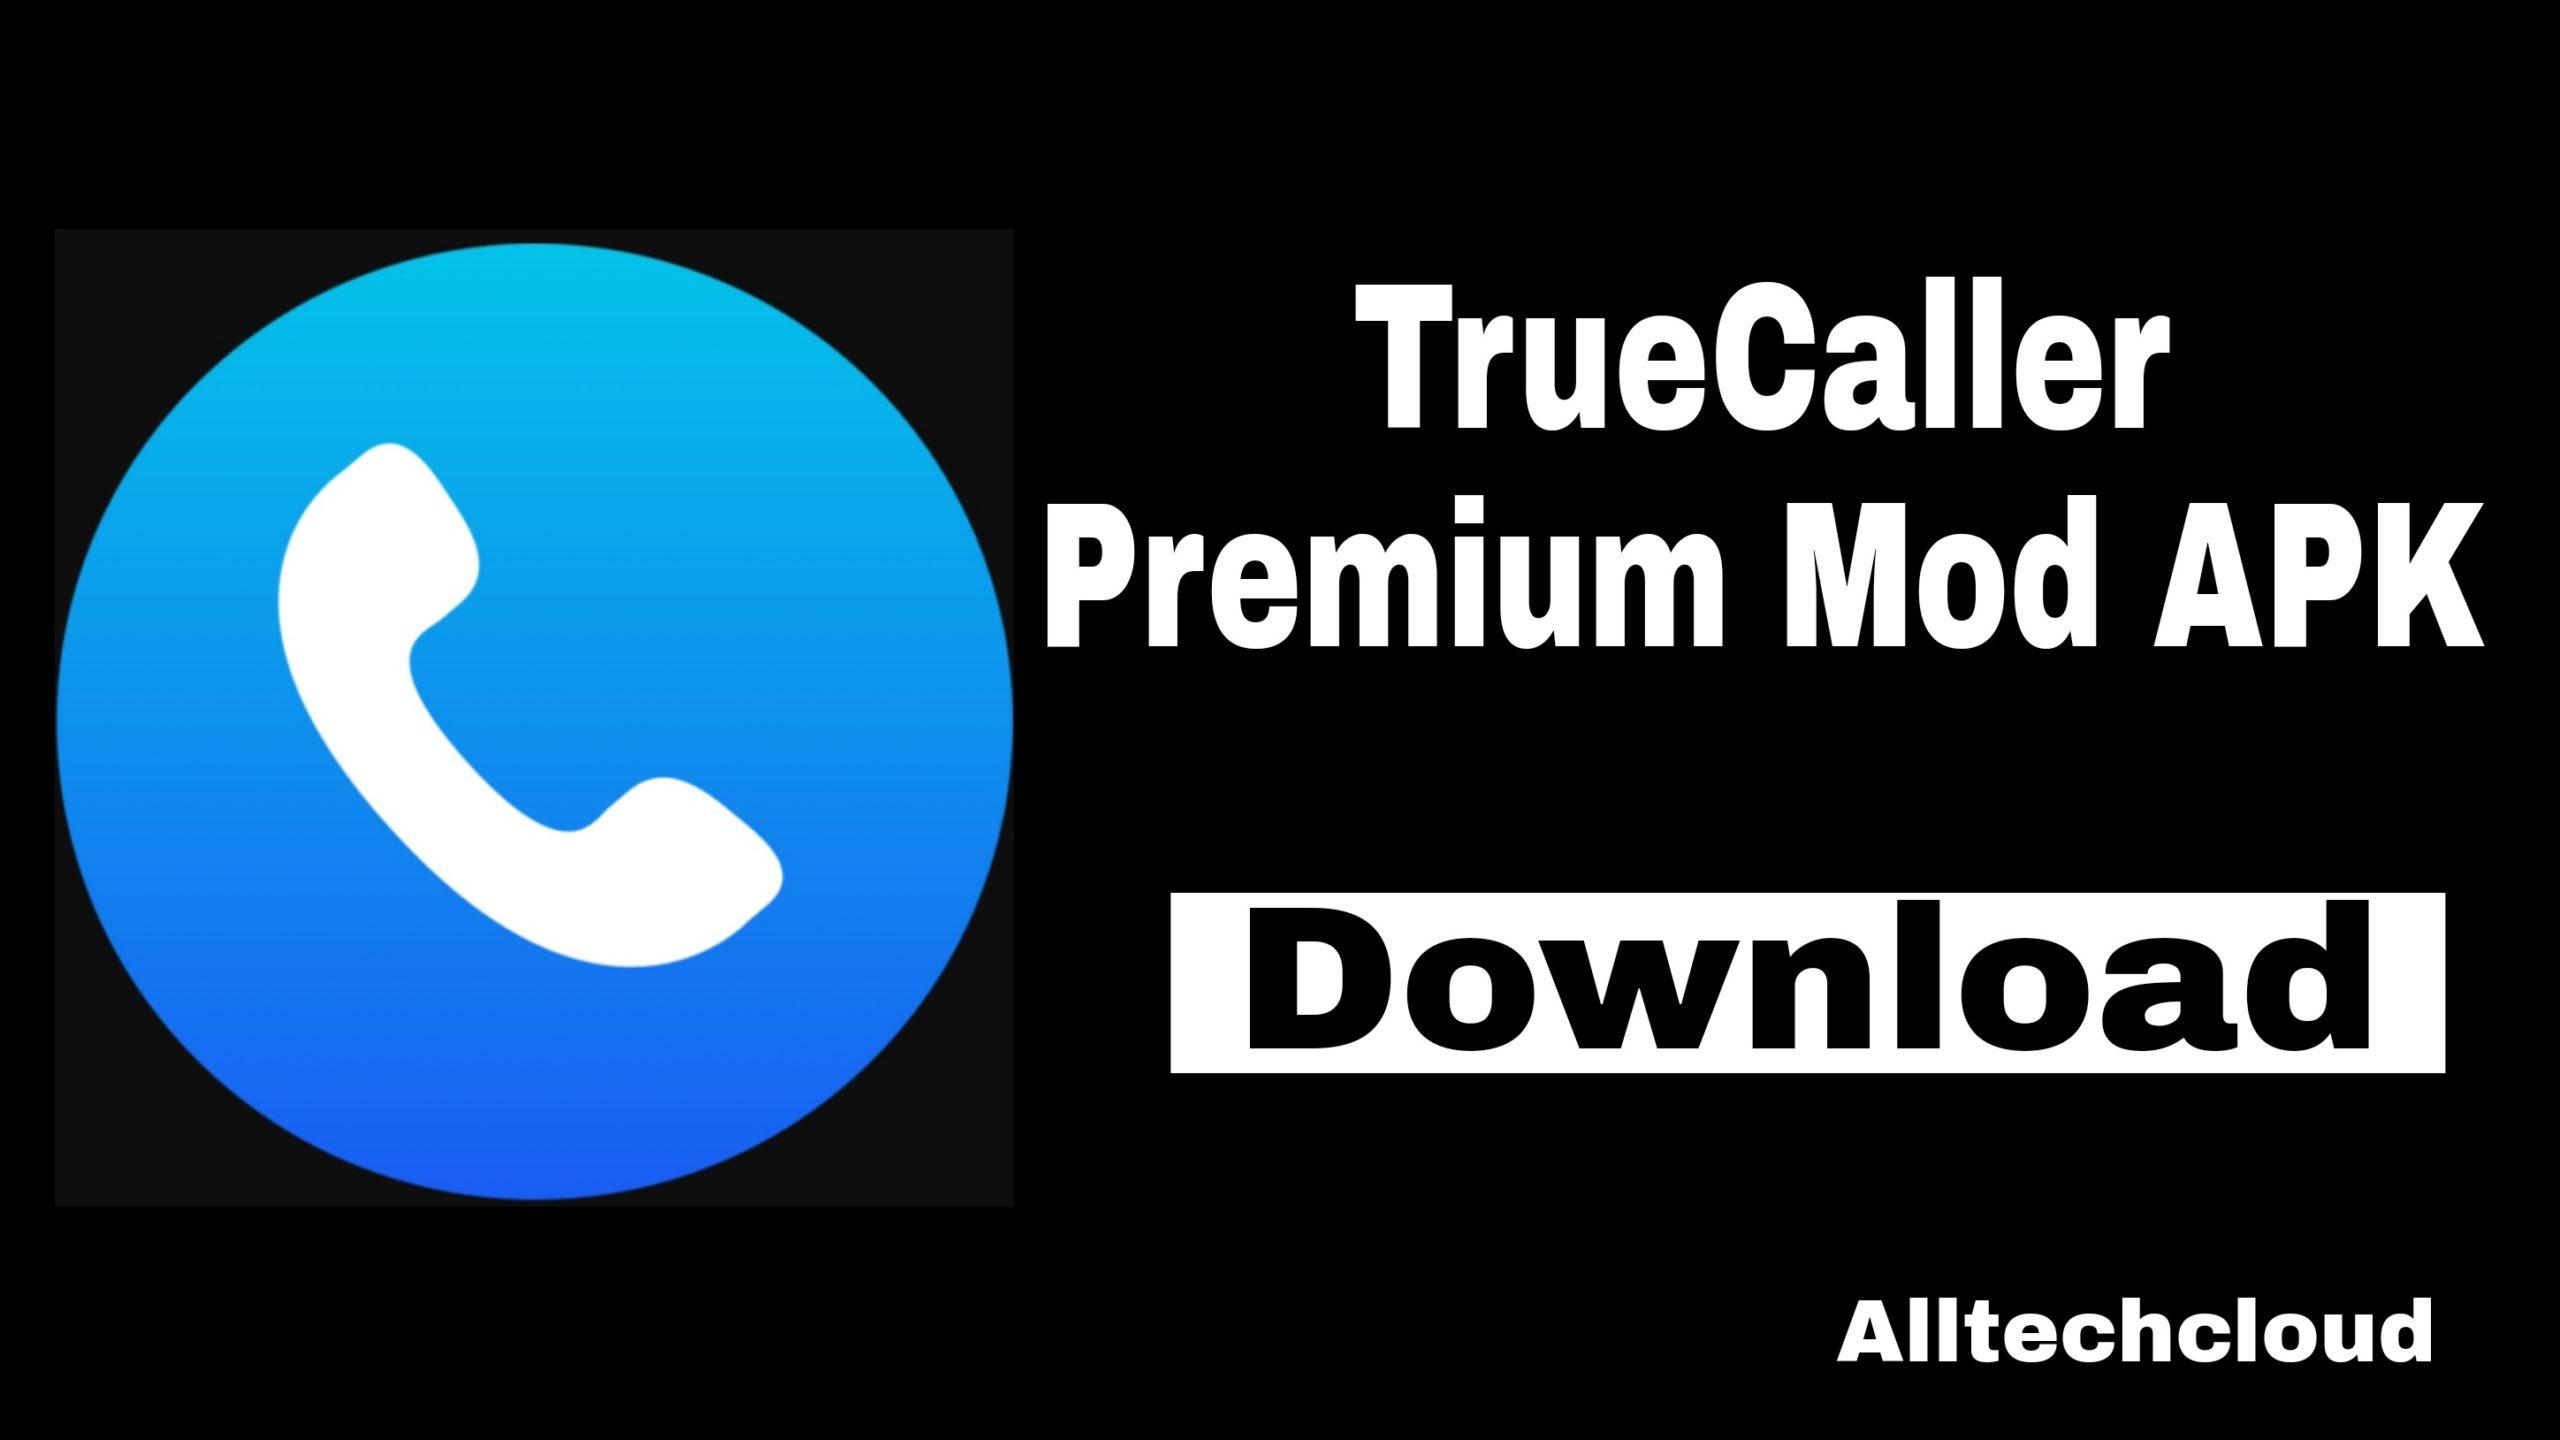 TrueCaller Premium APK v11.68.7 Download (Pro/Gold Mod Unlocked)